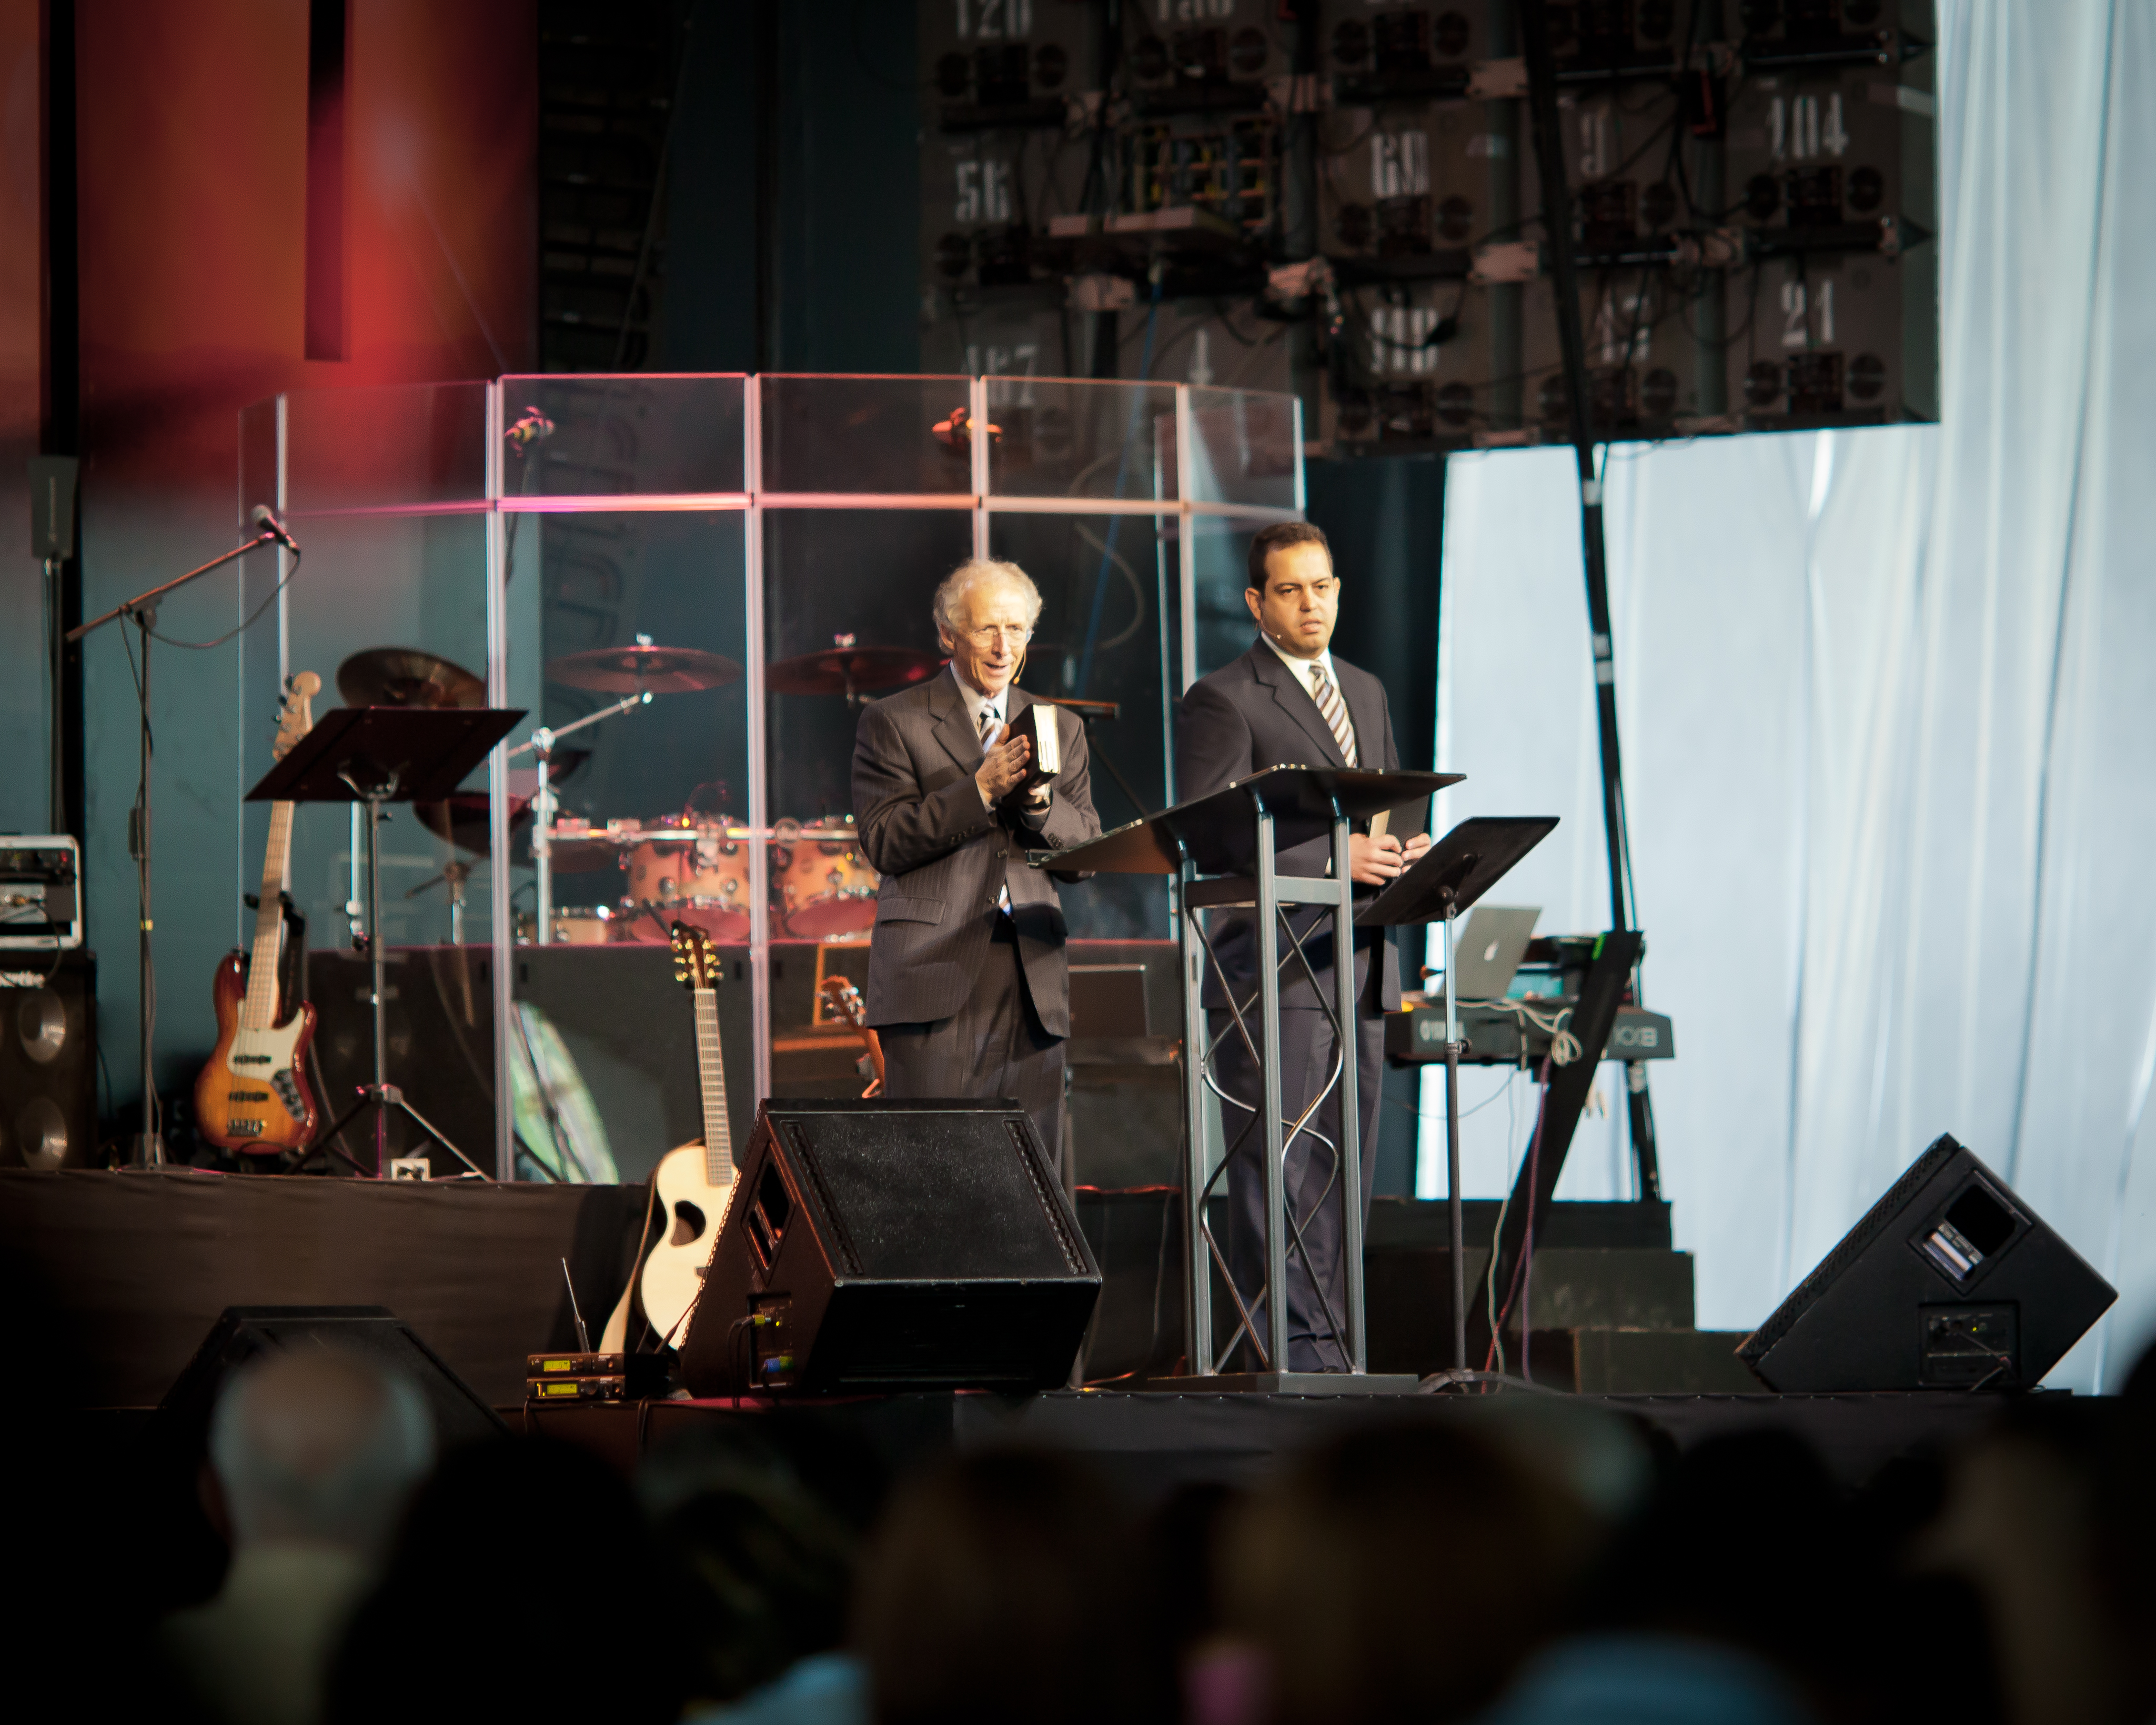 John Piper speaks in the Dominican Republic in 2010.